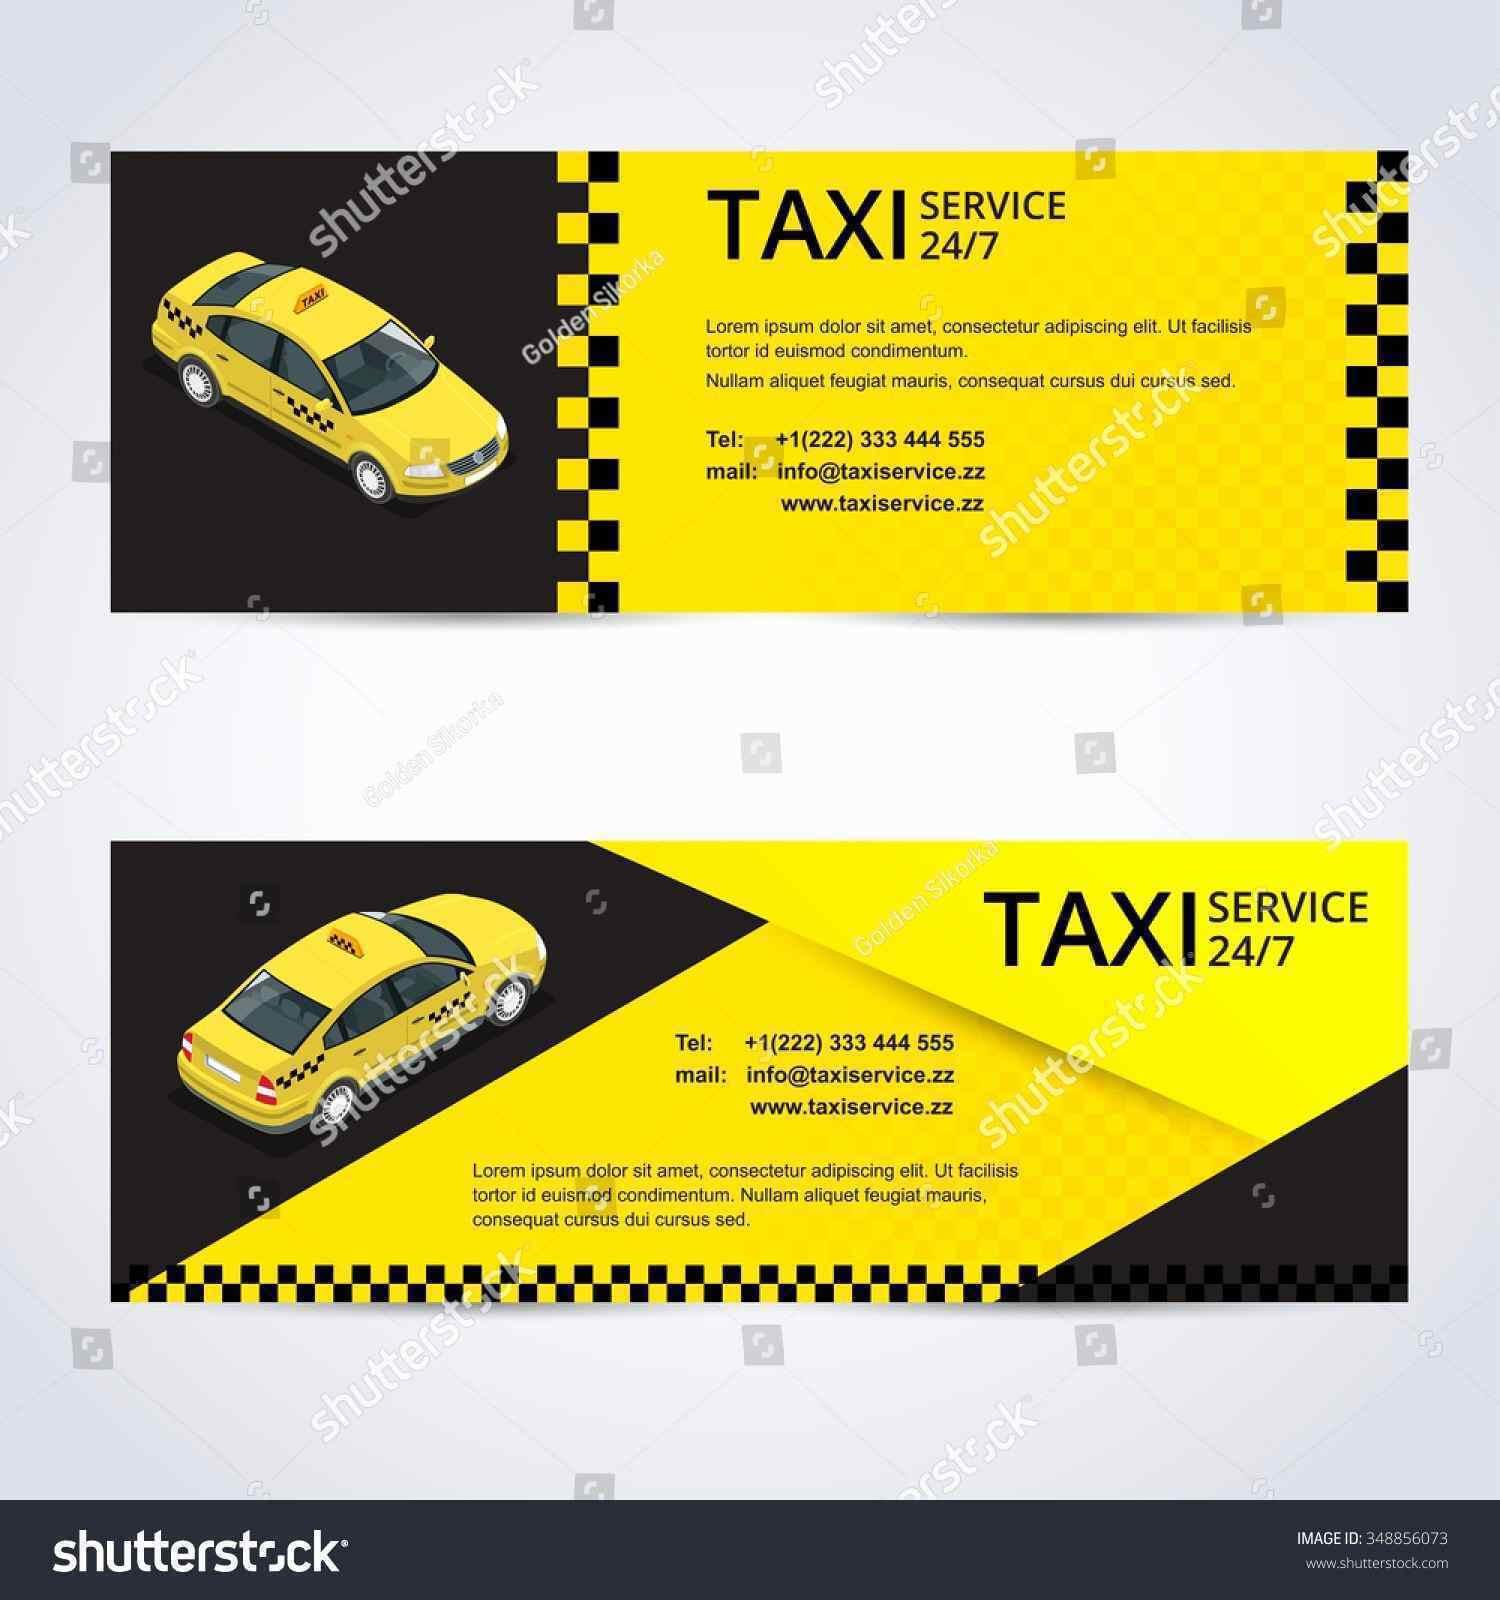 Public Transportation Business Cards Sample For Kit Inside Transport Business Cards Templates Free